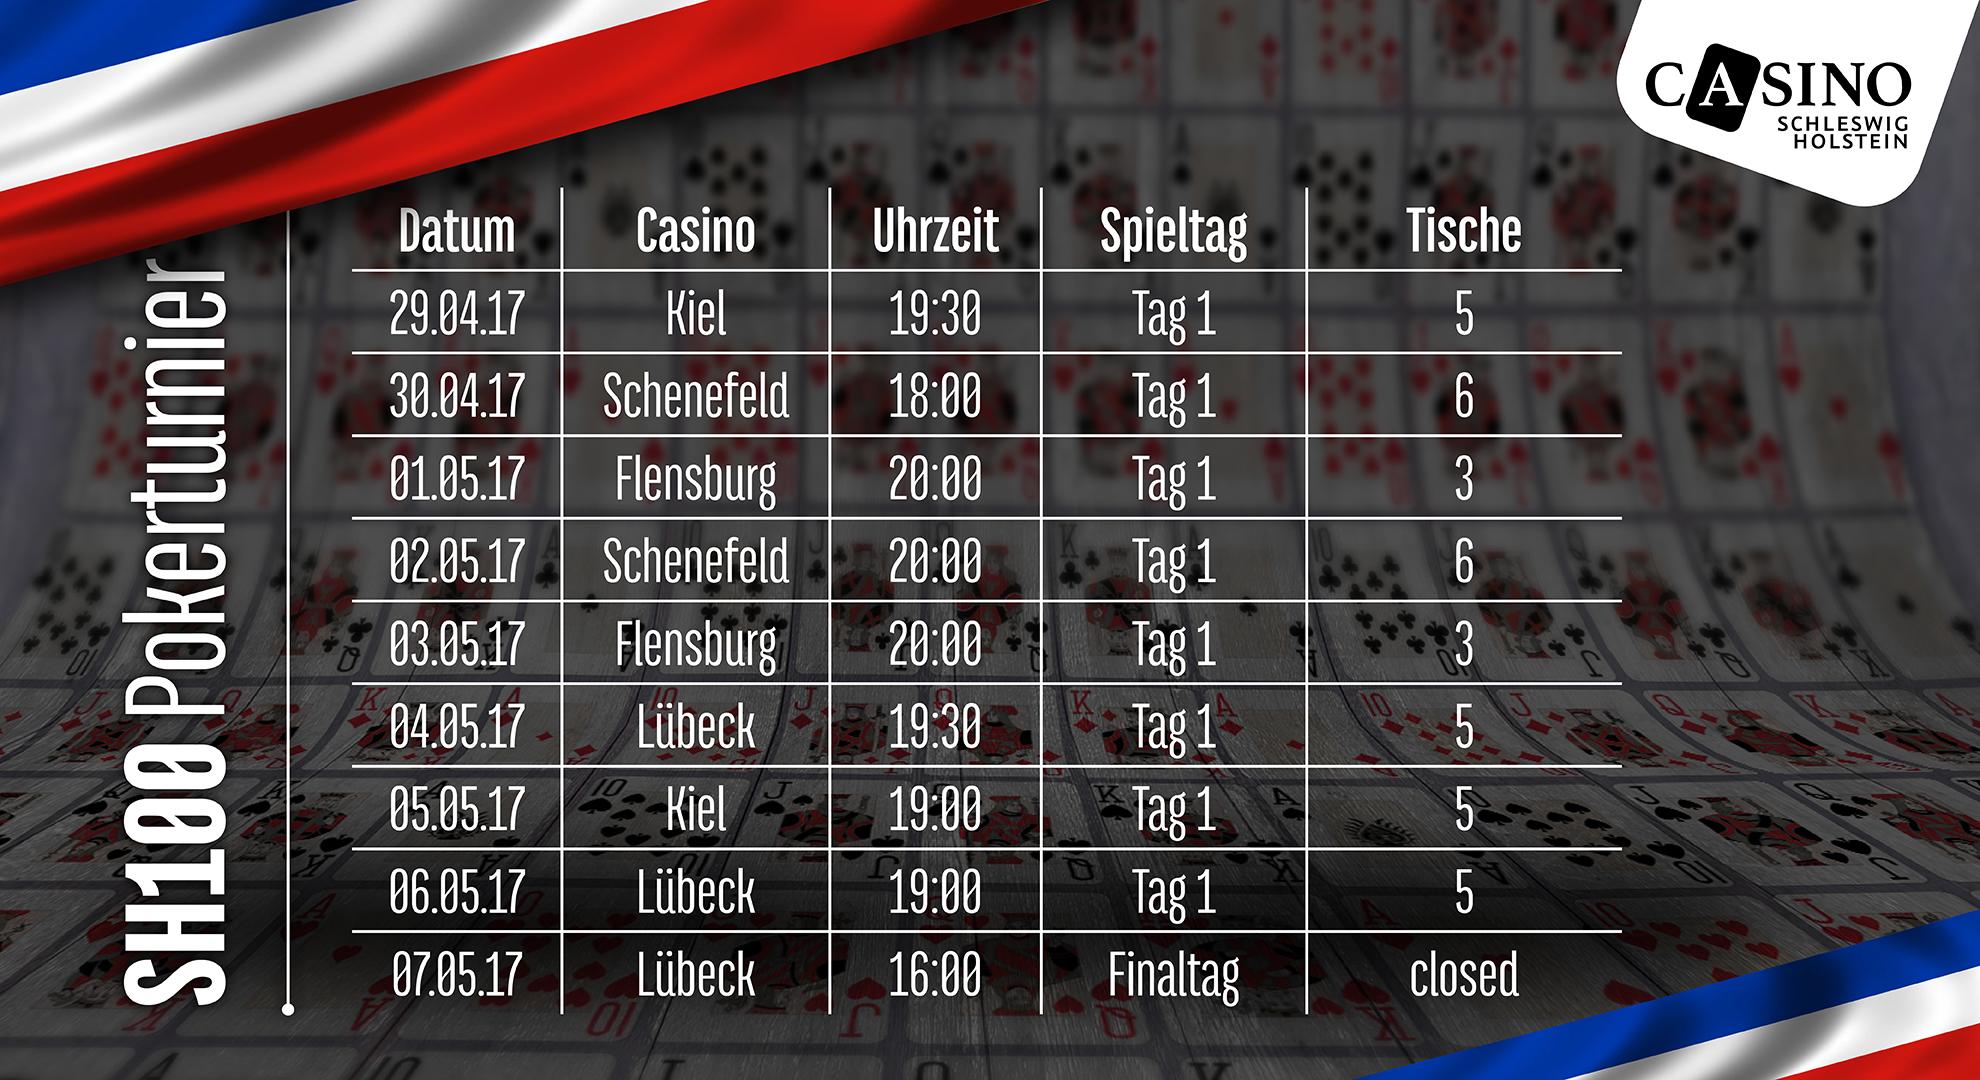 Casino_SH_SH_100_1980x1080px_v01_RZ_Turnierplan2